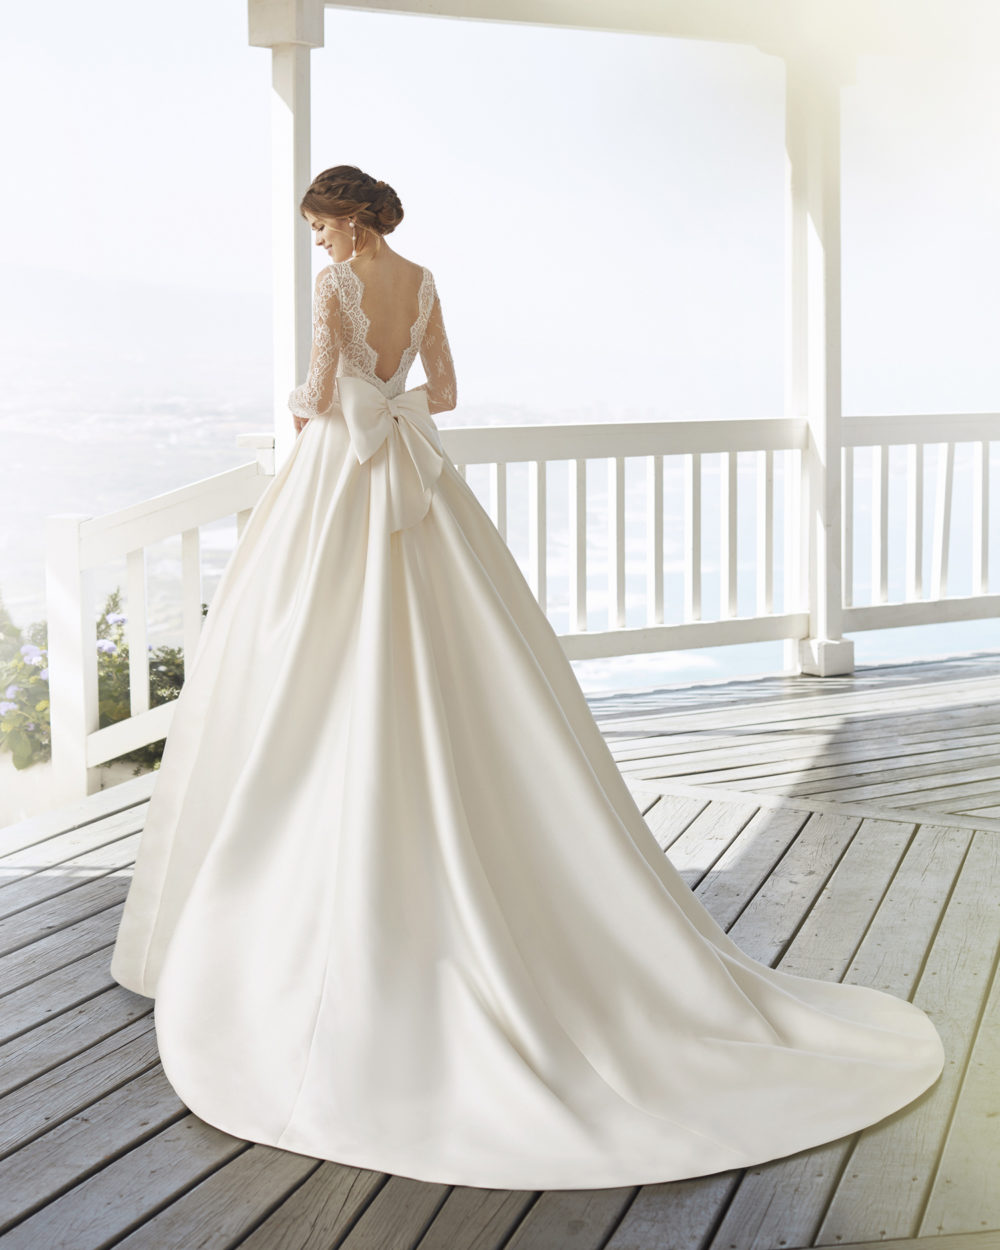 Mariages: abito da sposa Rosa Clarà 2020 a Vicenza, Verona, Padova, Veneto 4A2C8 CUZCO